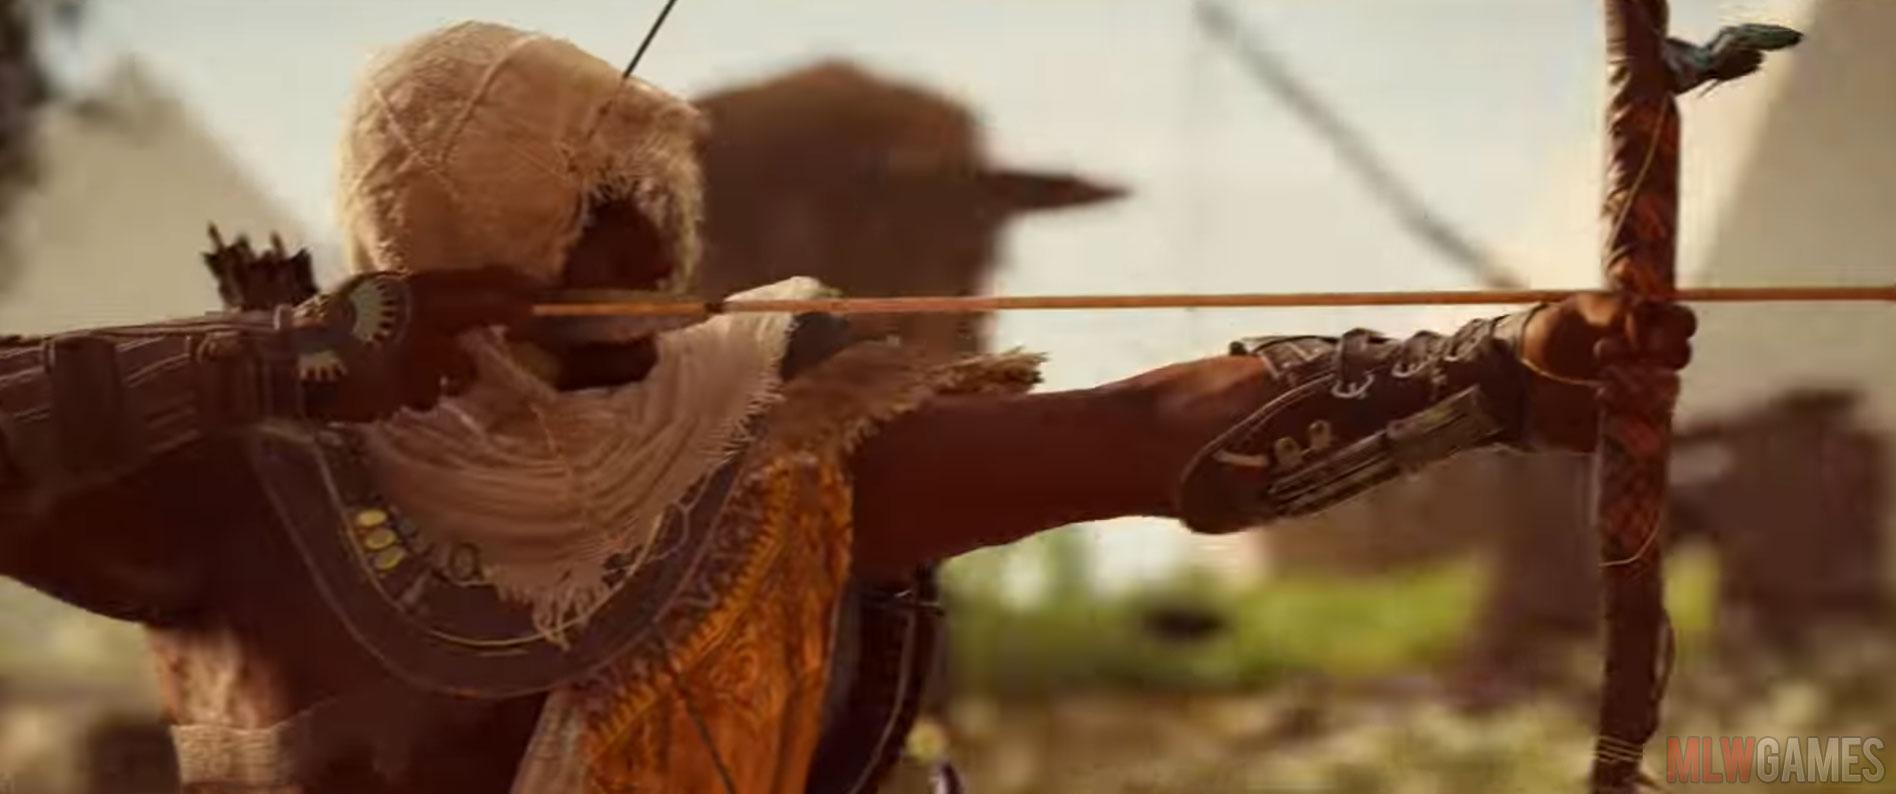 Assassins Creed Origins 17